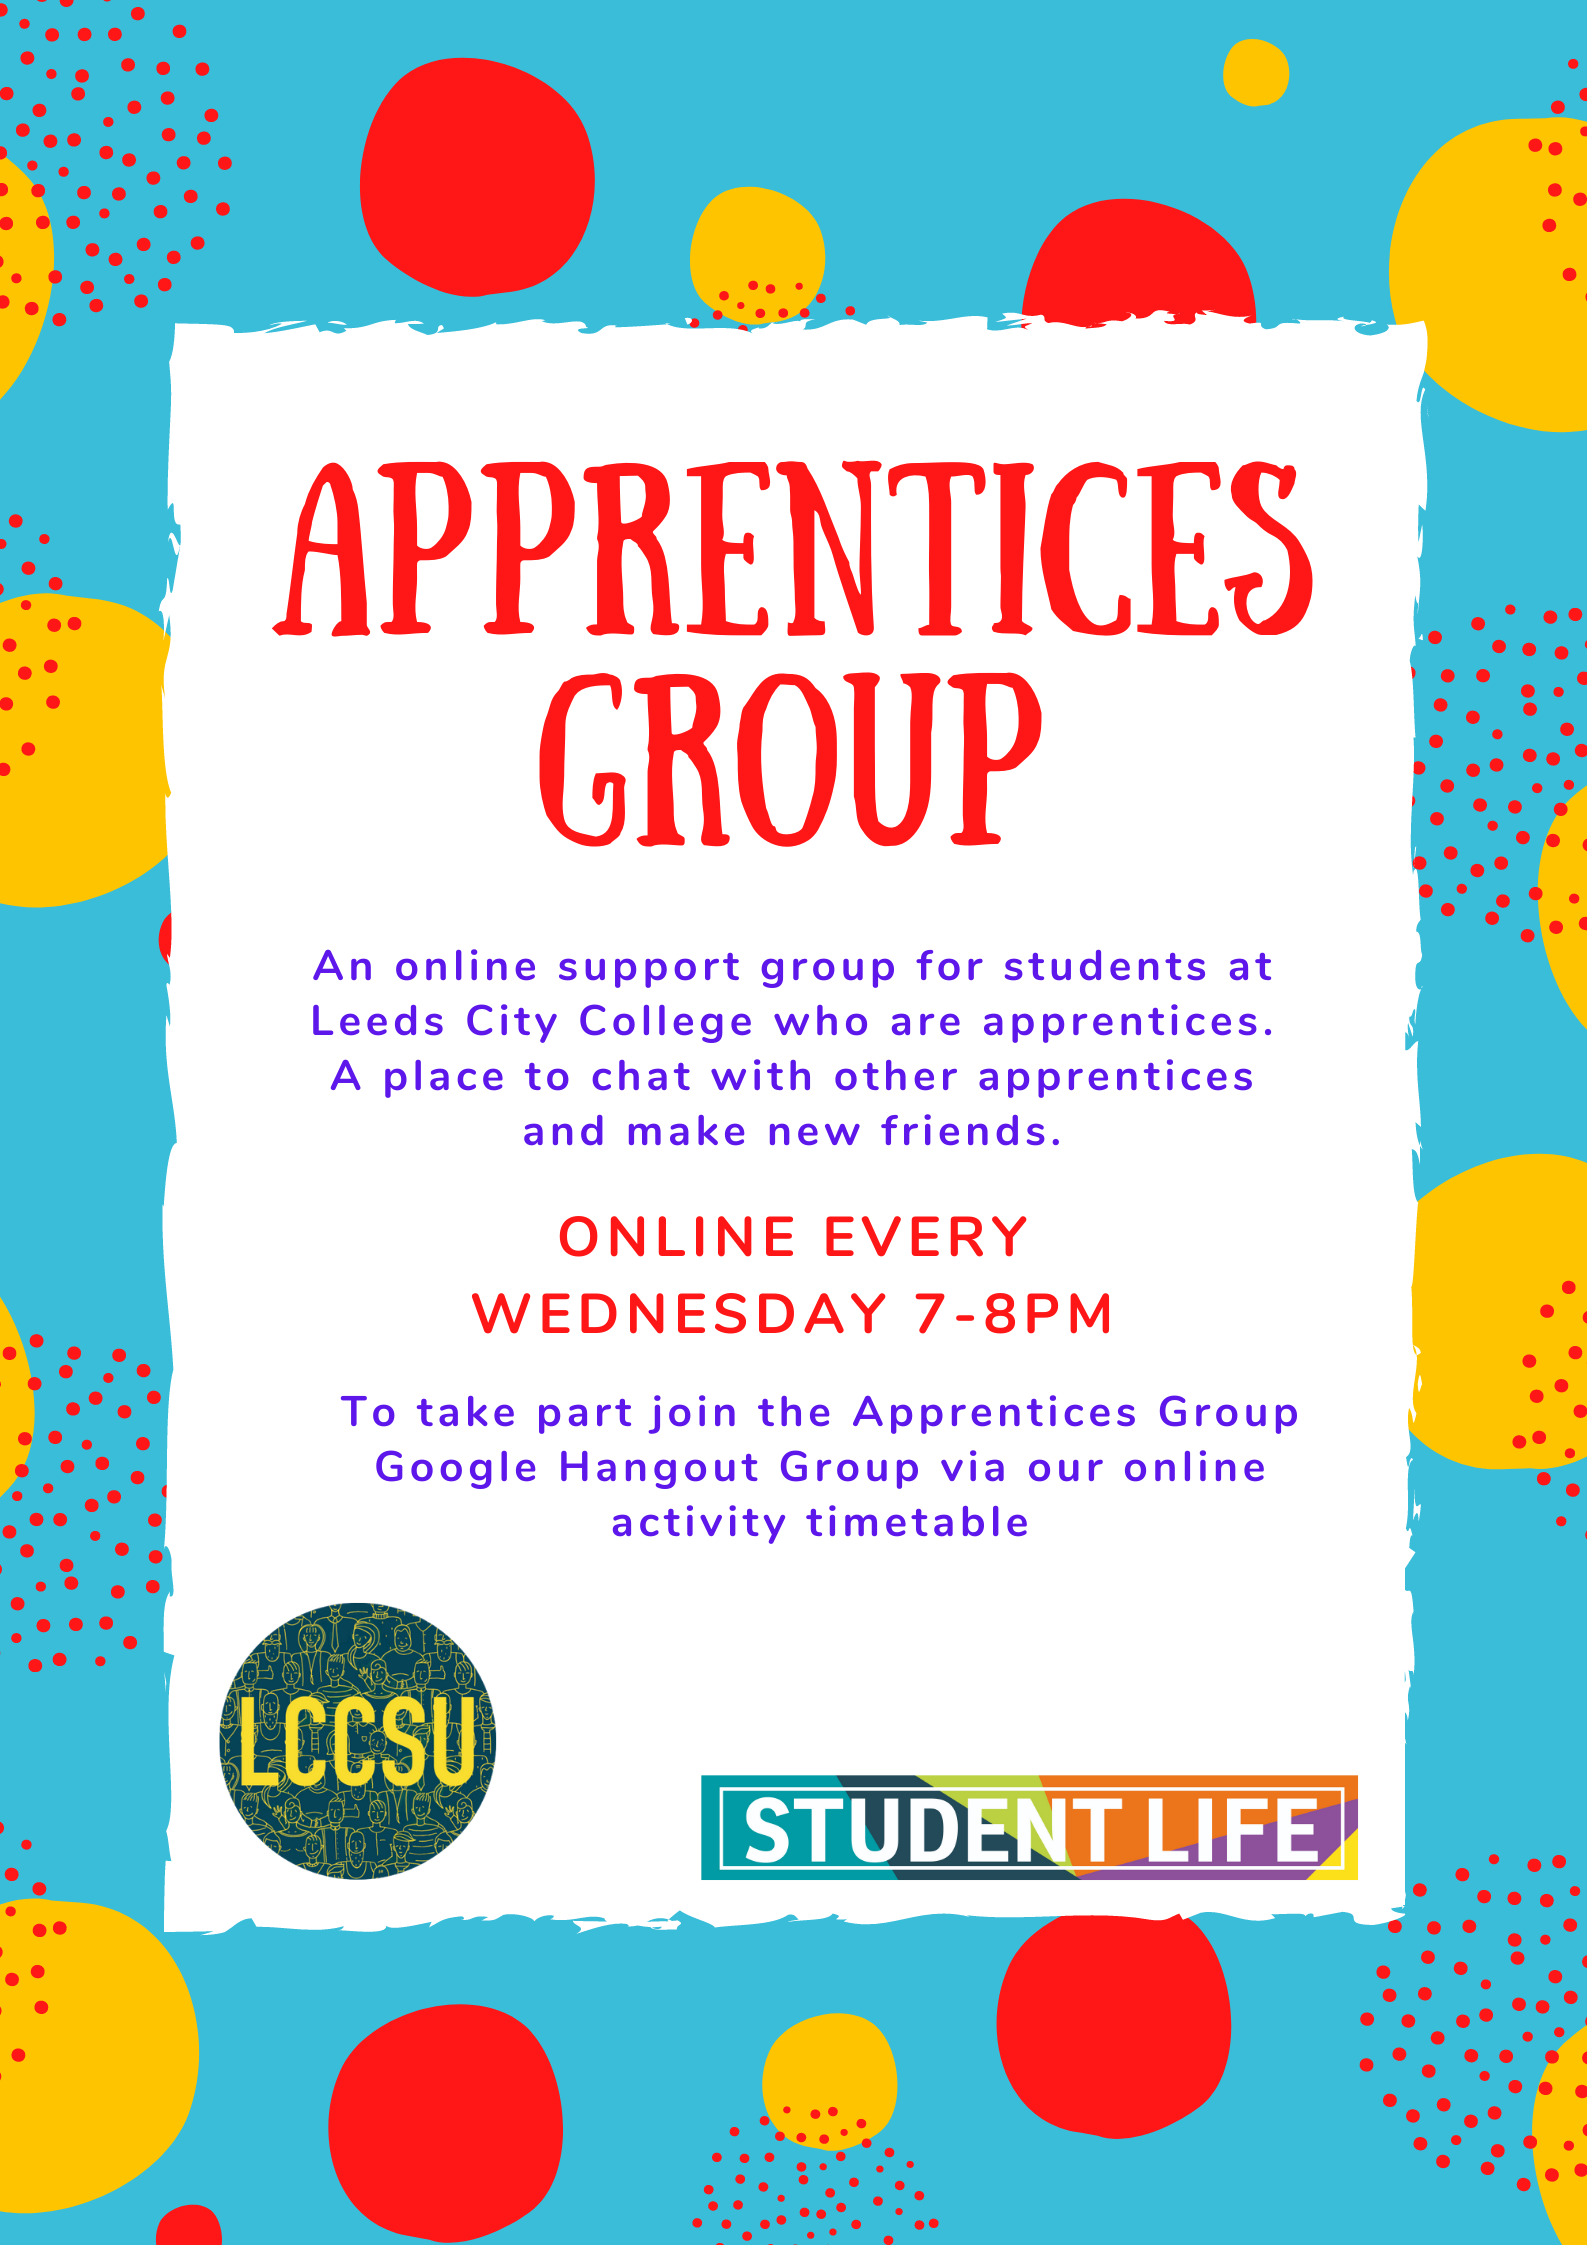 Apprentices group website